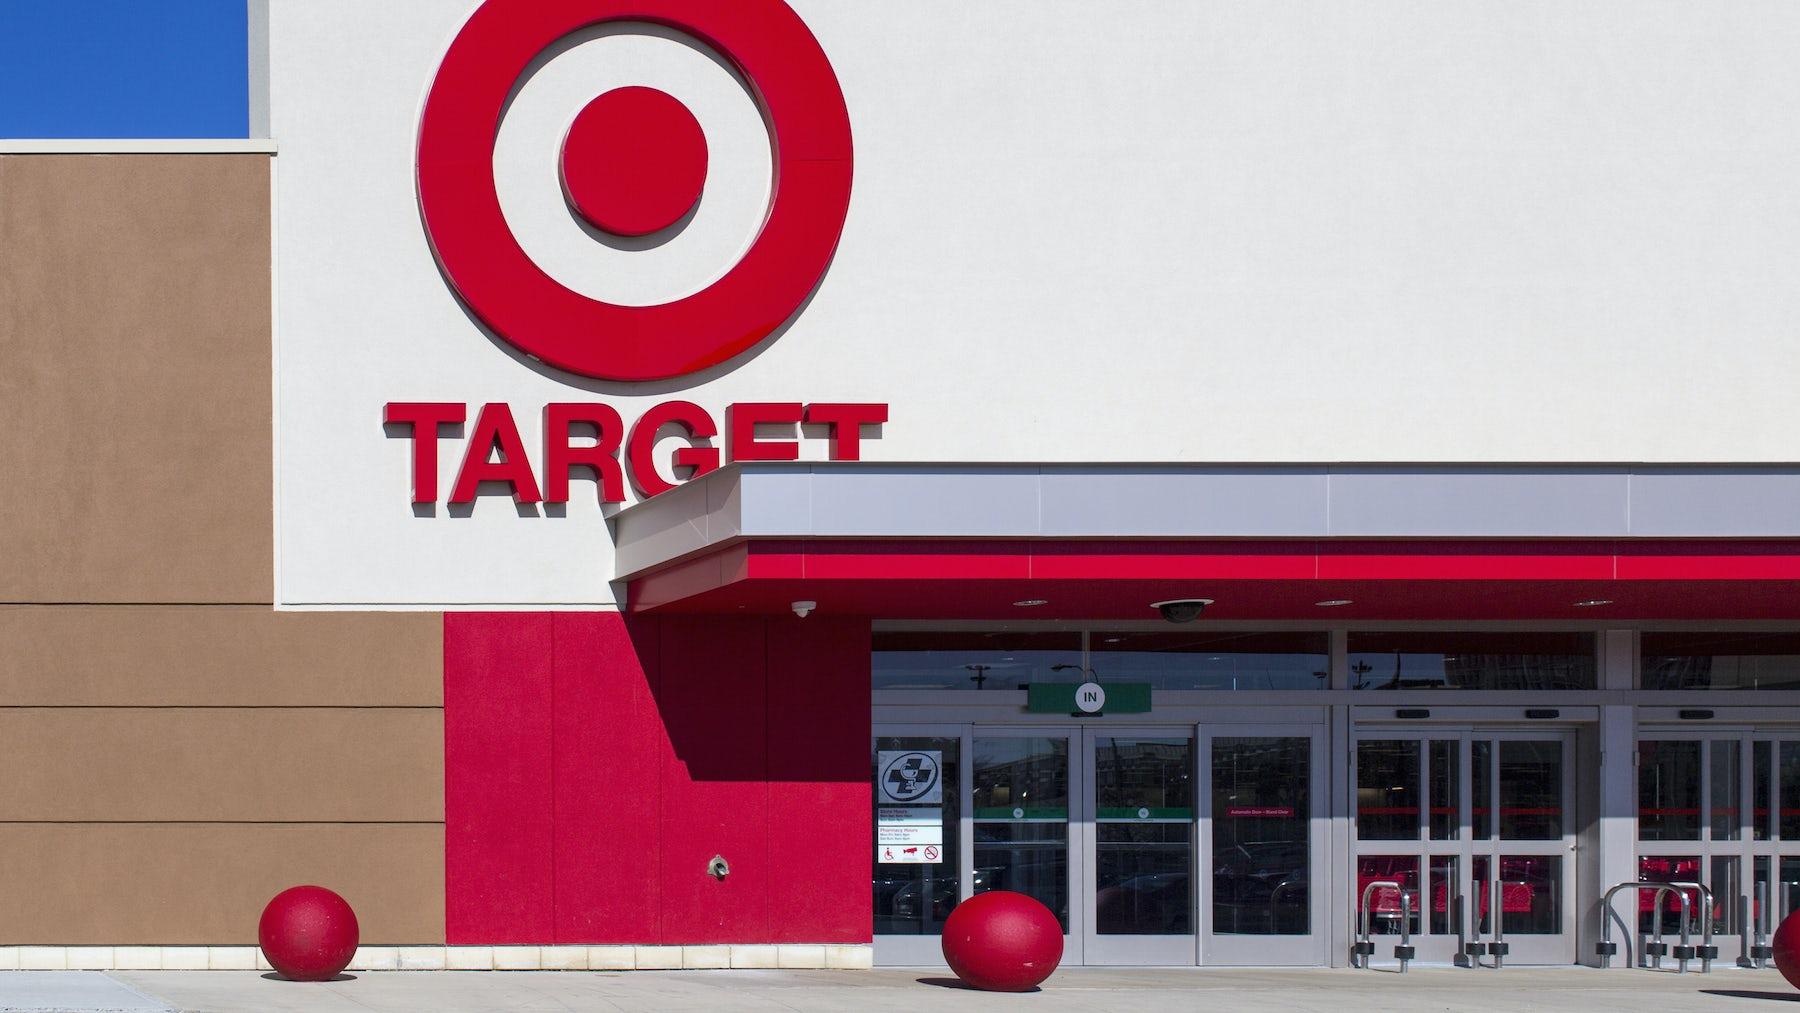 Target Store | Source: Shutterstock